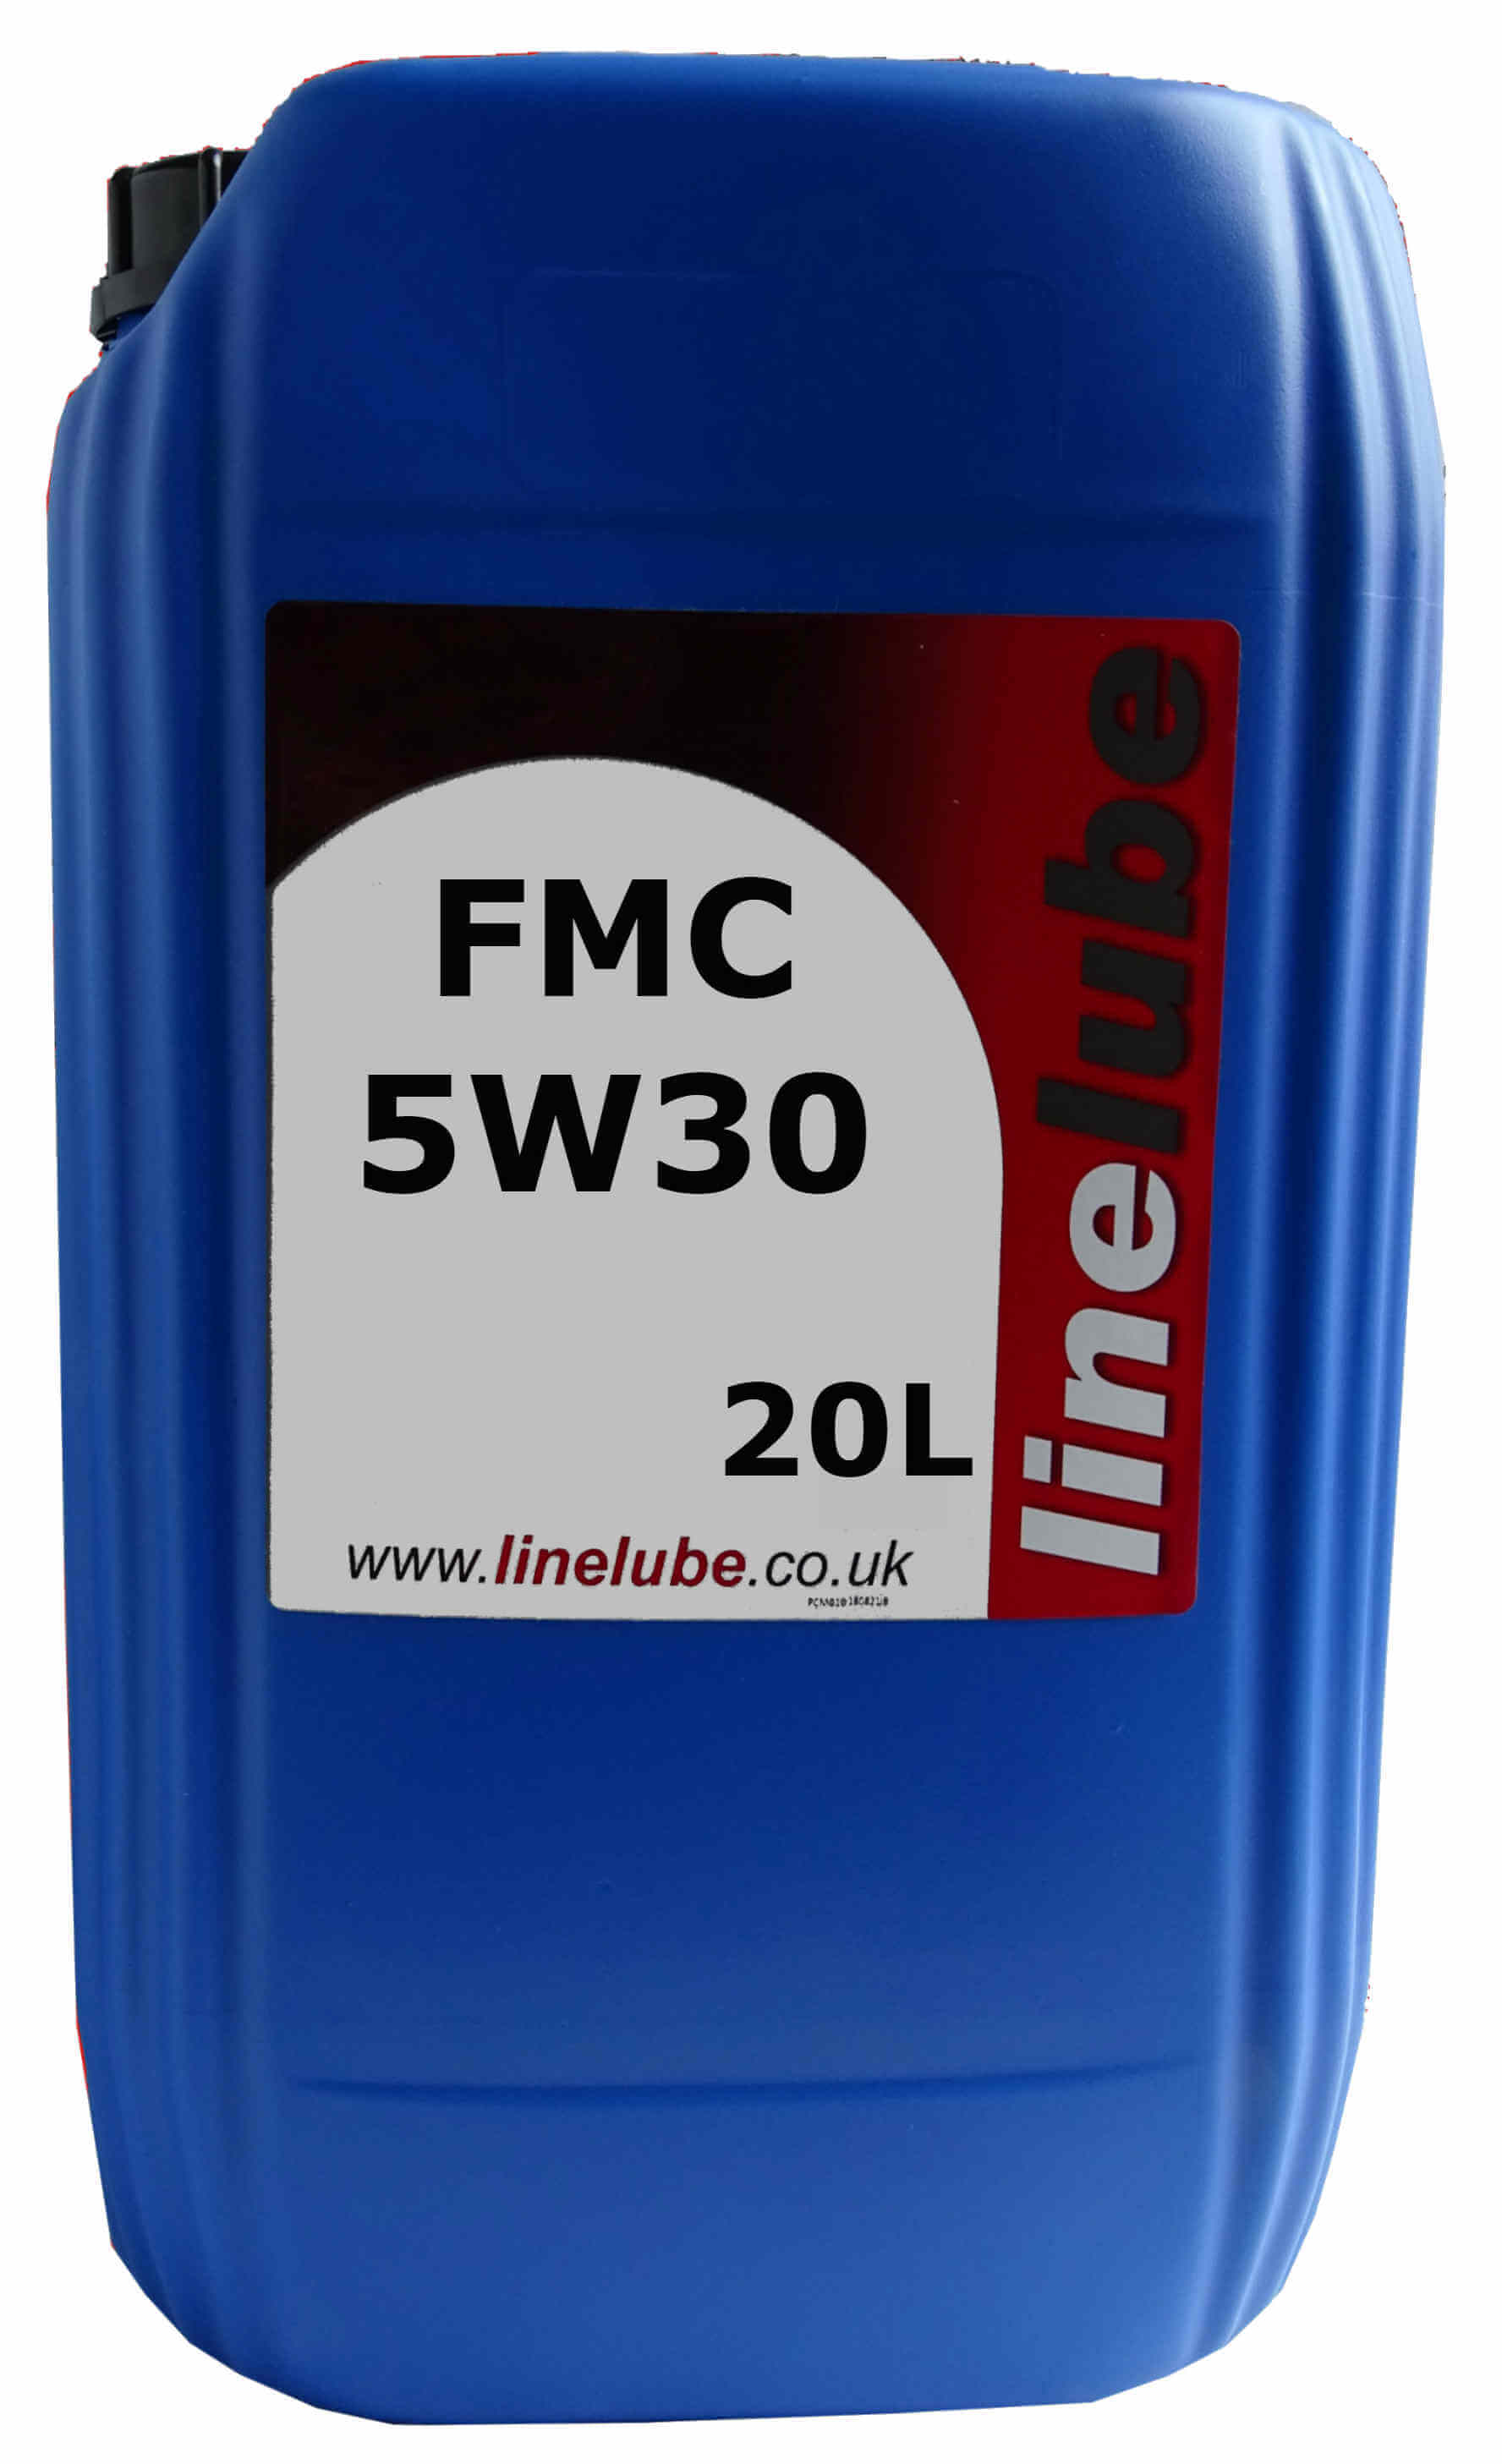 linelube FMC 5W30